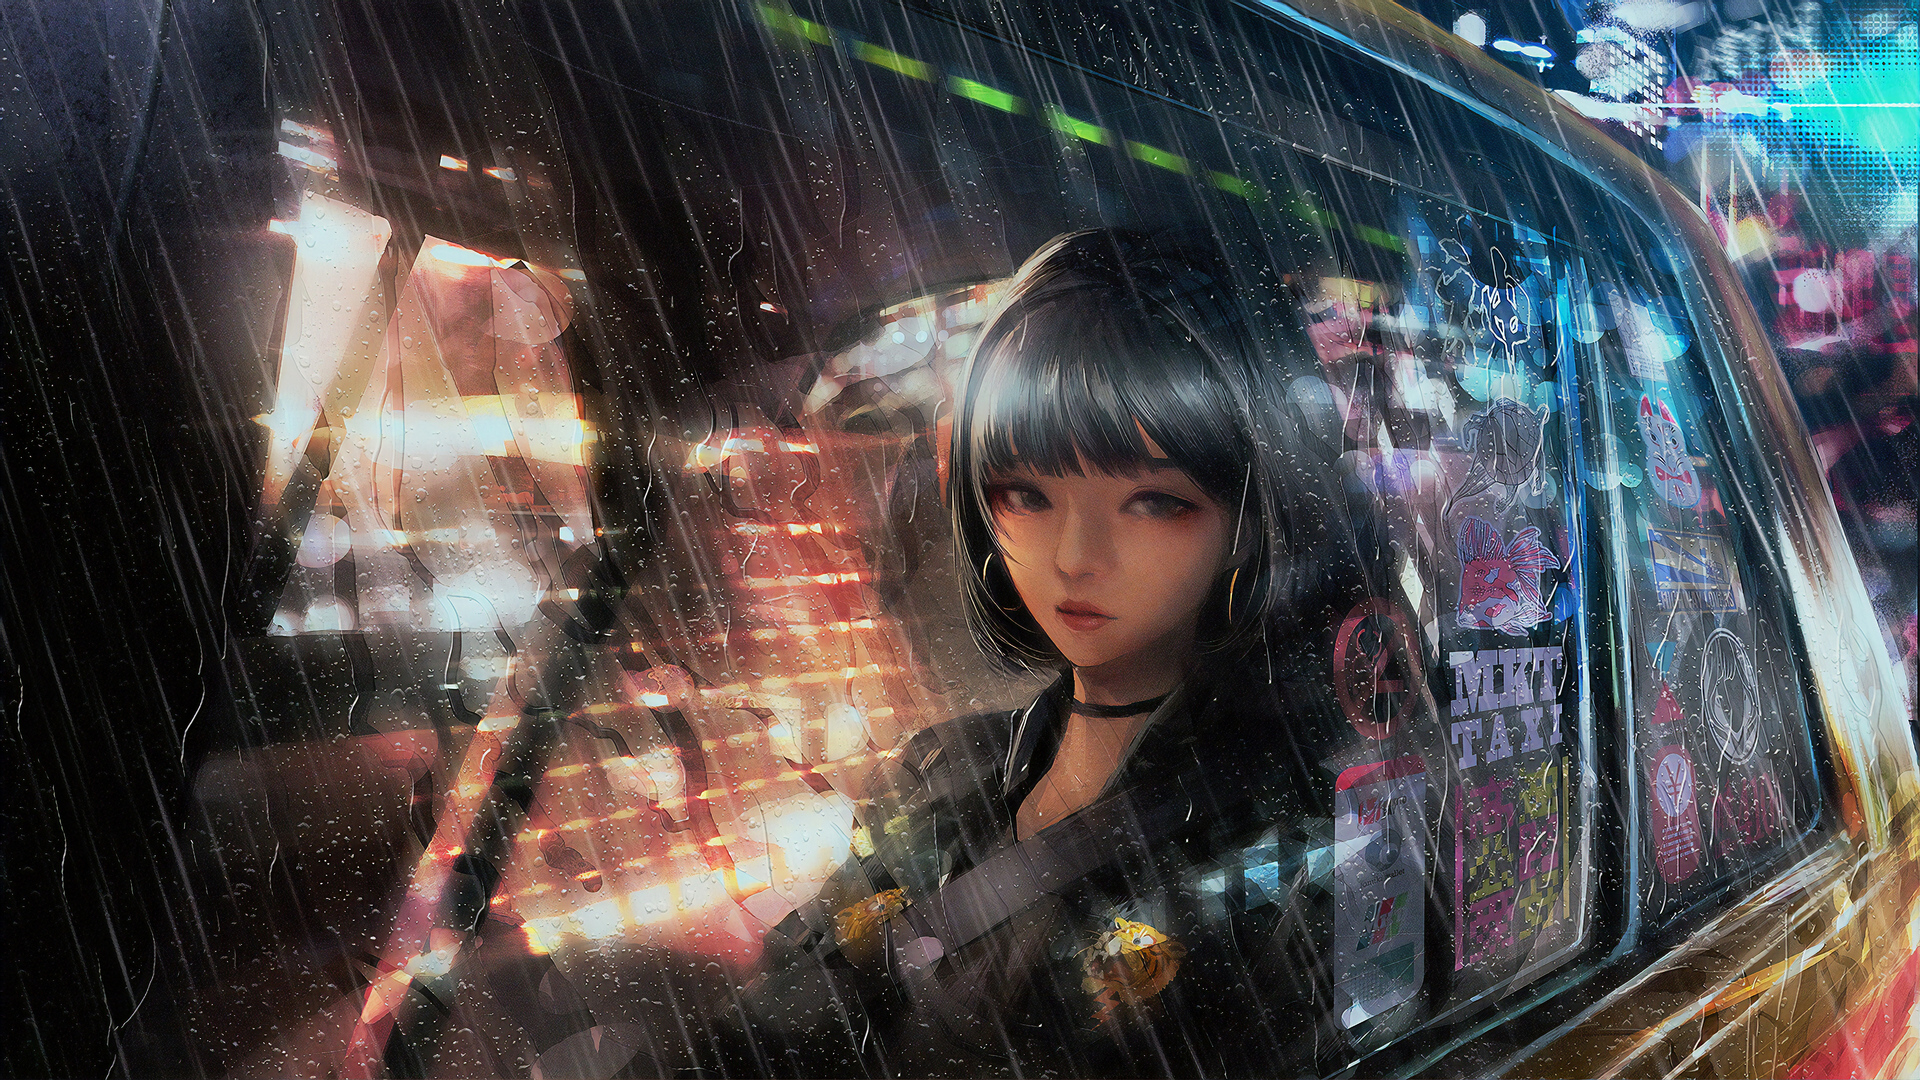 1920x1080 Anime Girl In Taxi Raining 4k Laptop Full HD ...